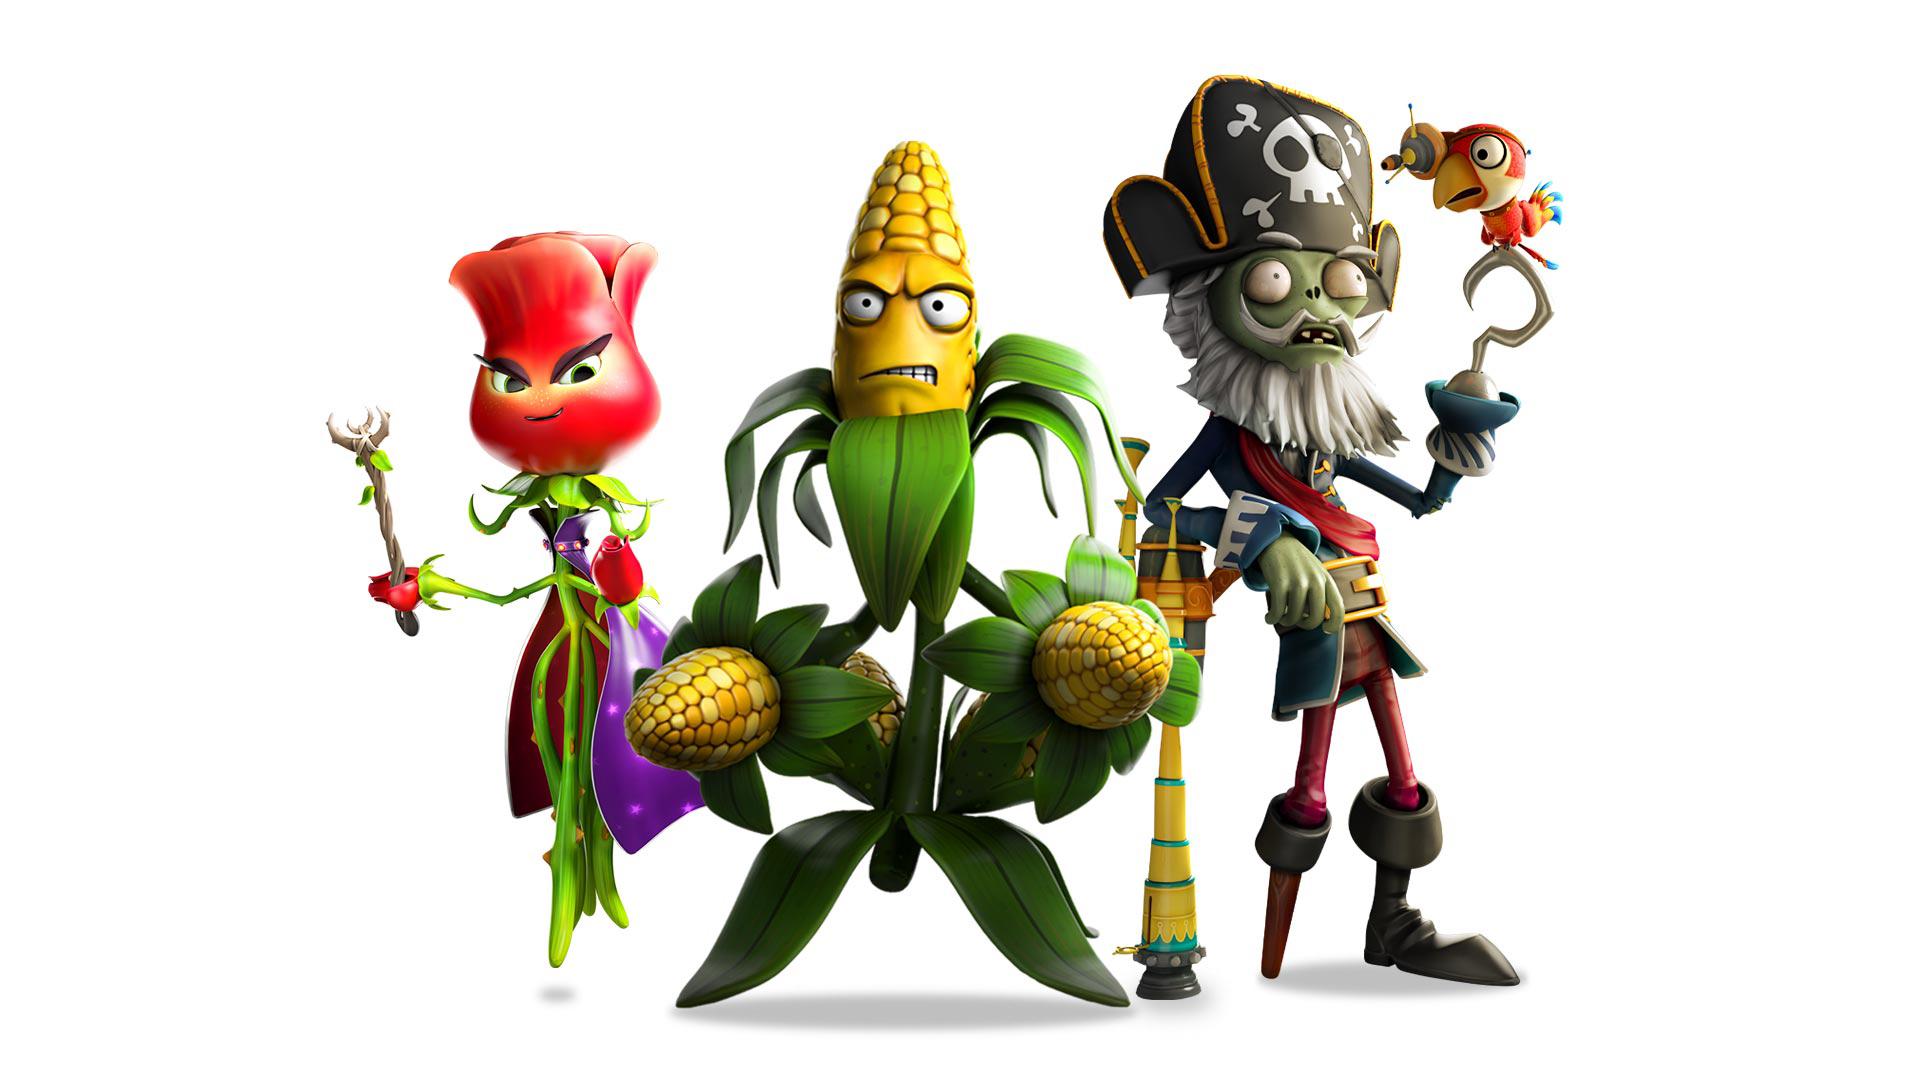 Plants Vs Zombies Garden Warfare 2 Ea Access And Origin Access Trials Start February 18